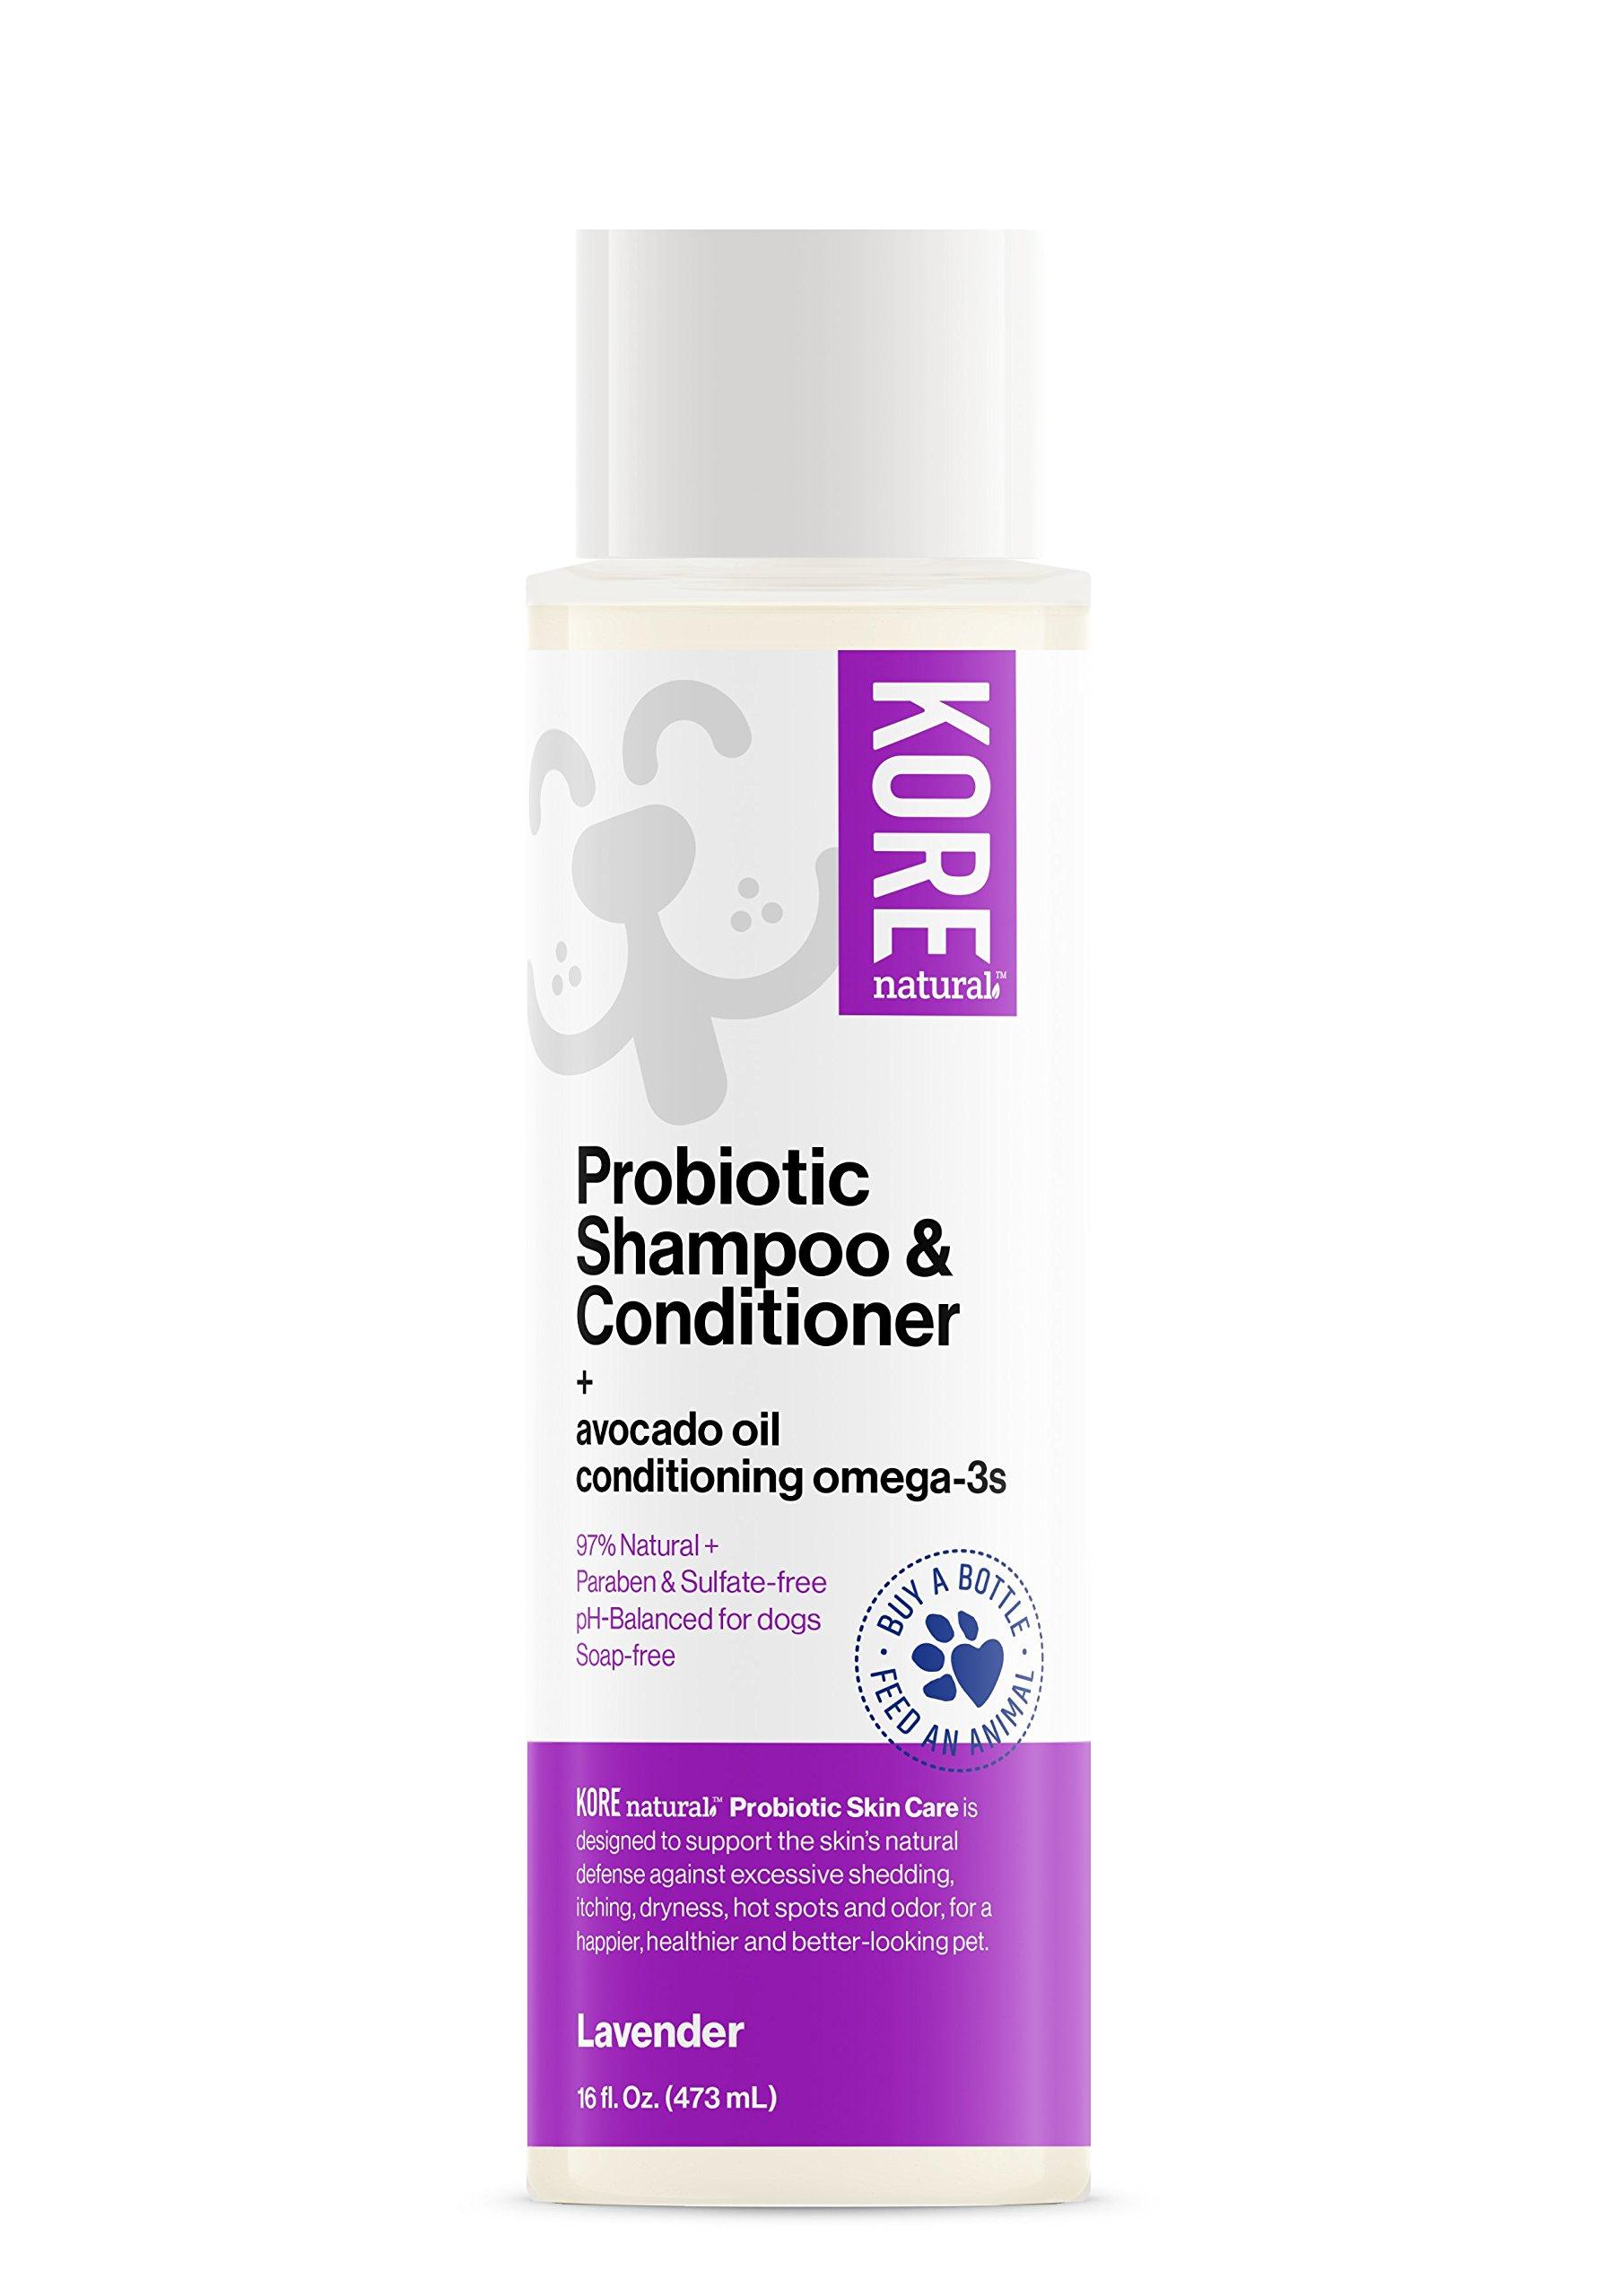 KORE NATURAL Probiotic Shampoo Plus Conditioner Lavender, 16 Ounce Bottle